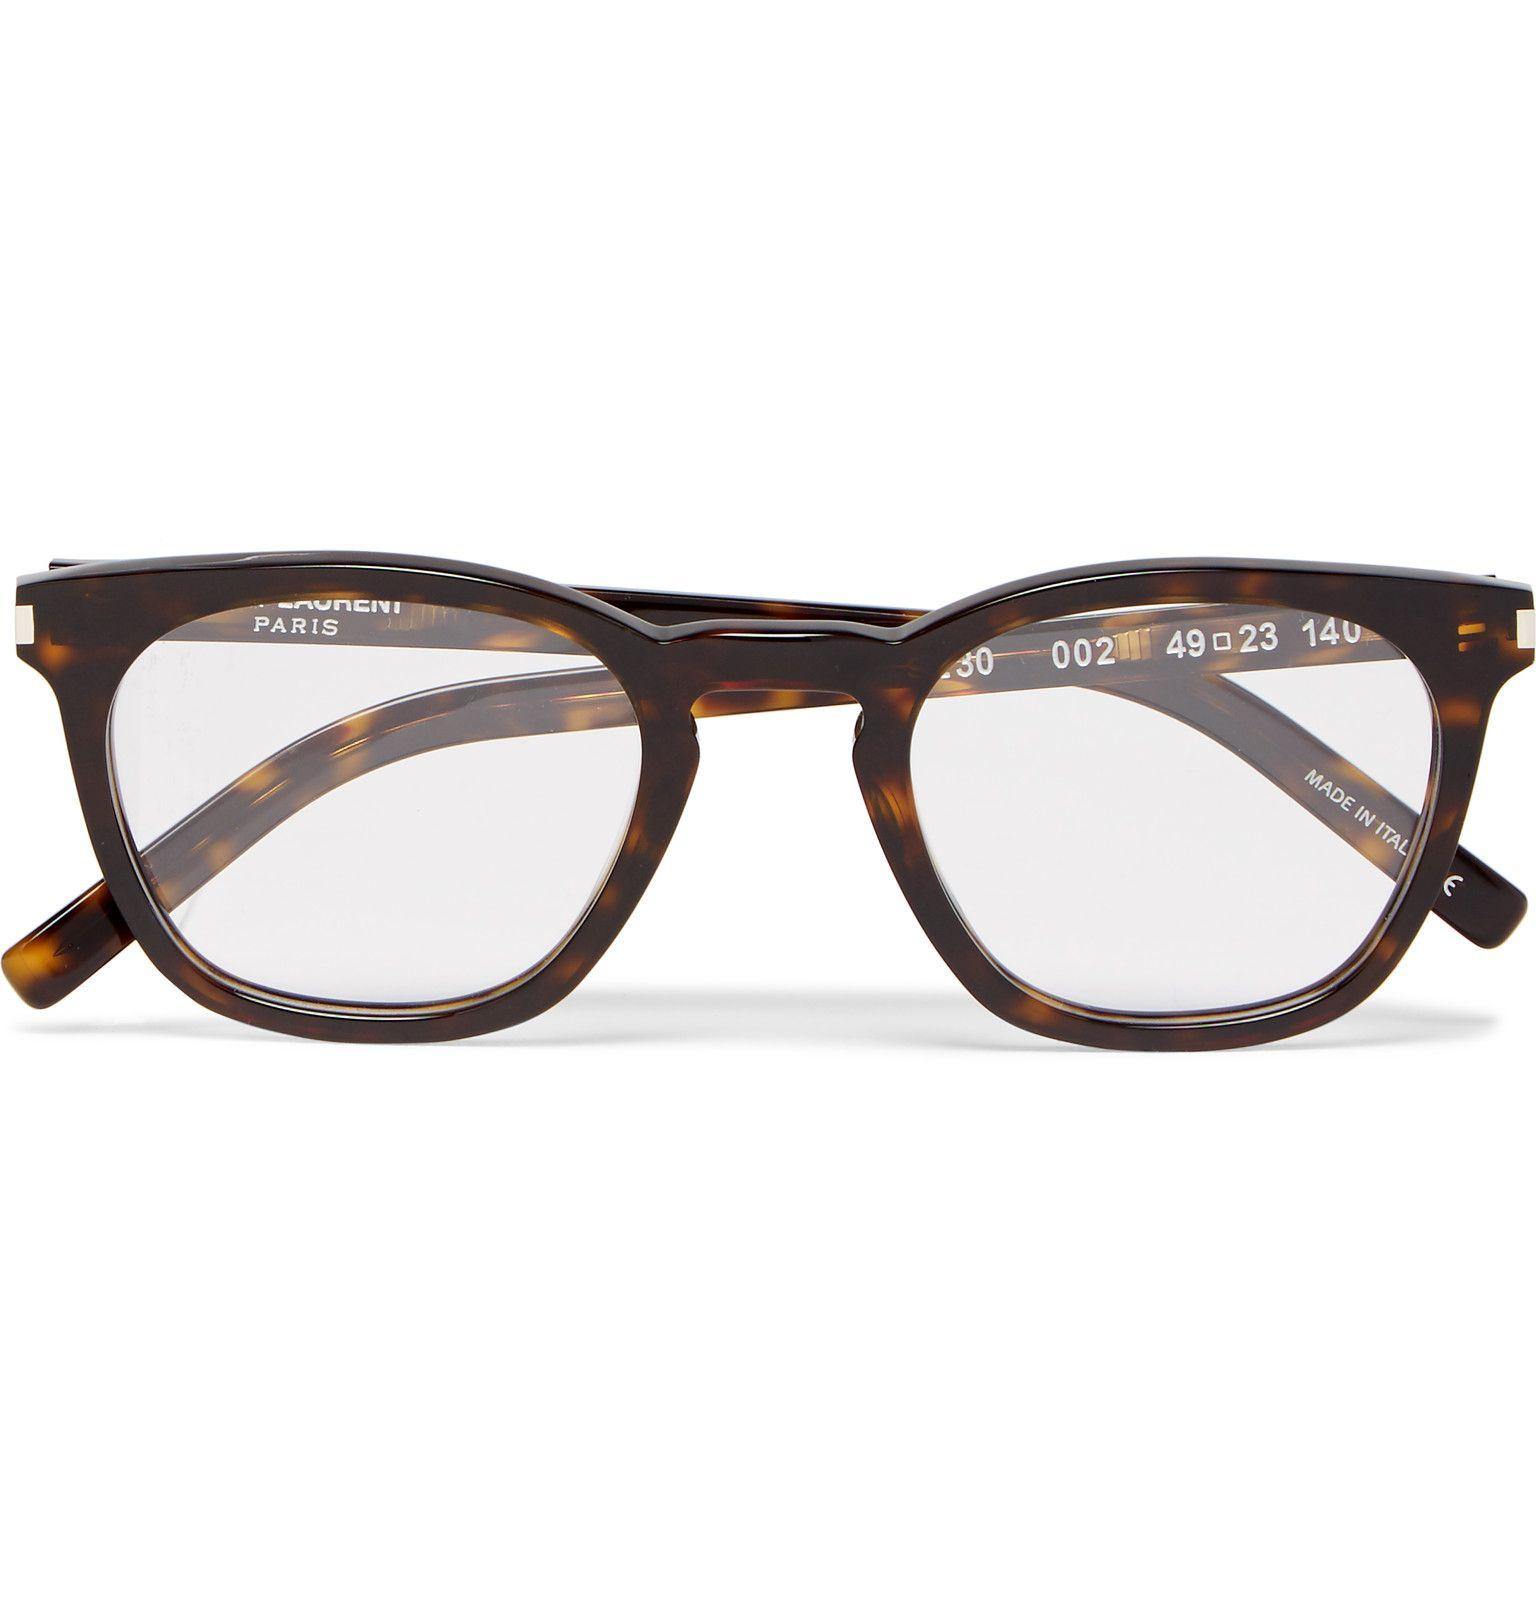 99afaebf14 Saint Laurent - Havana Square-Frame Tortoiseshell Acetate Optical Glasses